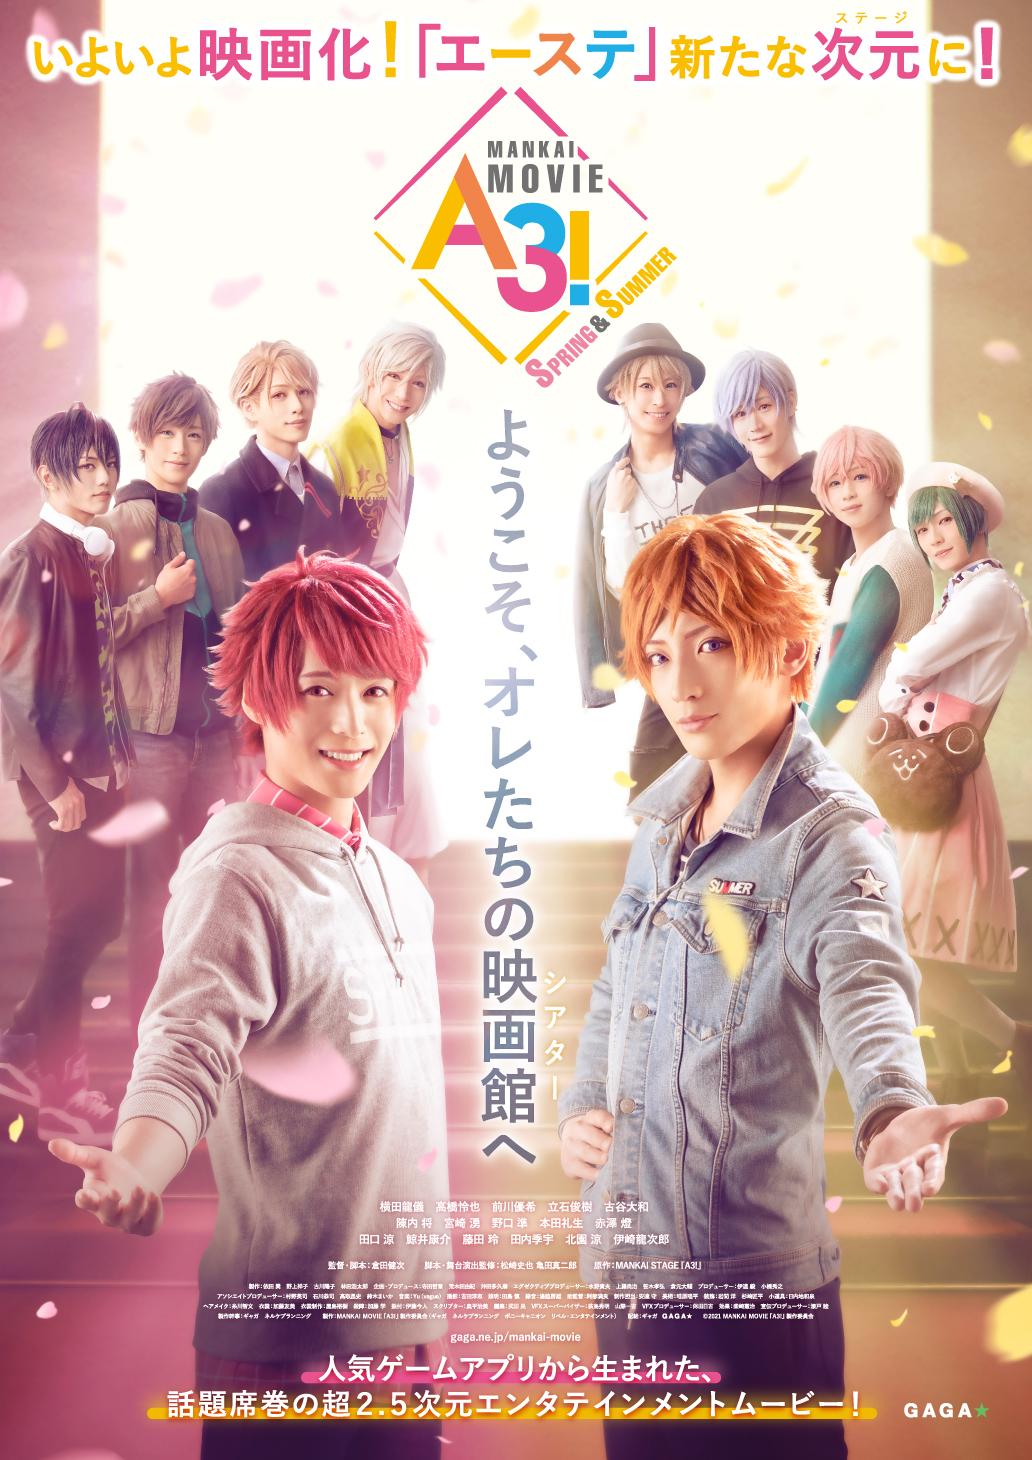 MANKAI MOVIE「A3!」〜SPRING & SUMMER〜 12月3日(金)公開!春夏組が勢揃いしたビジュアル解禁